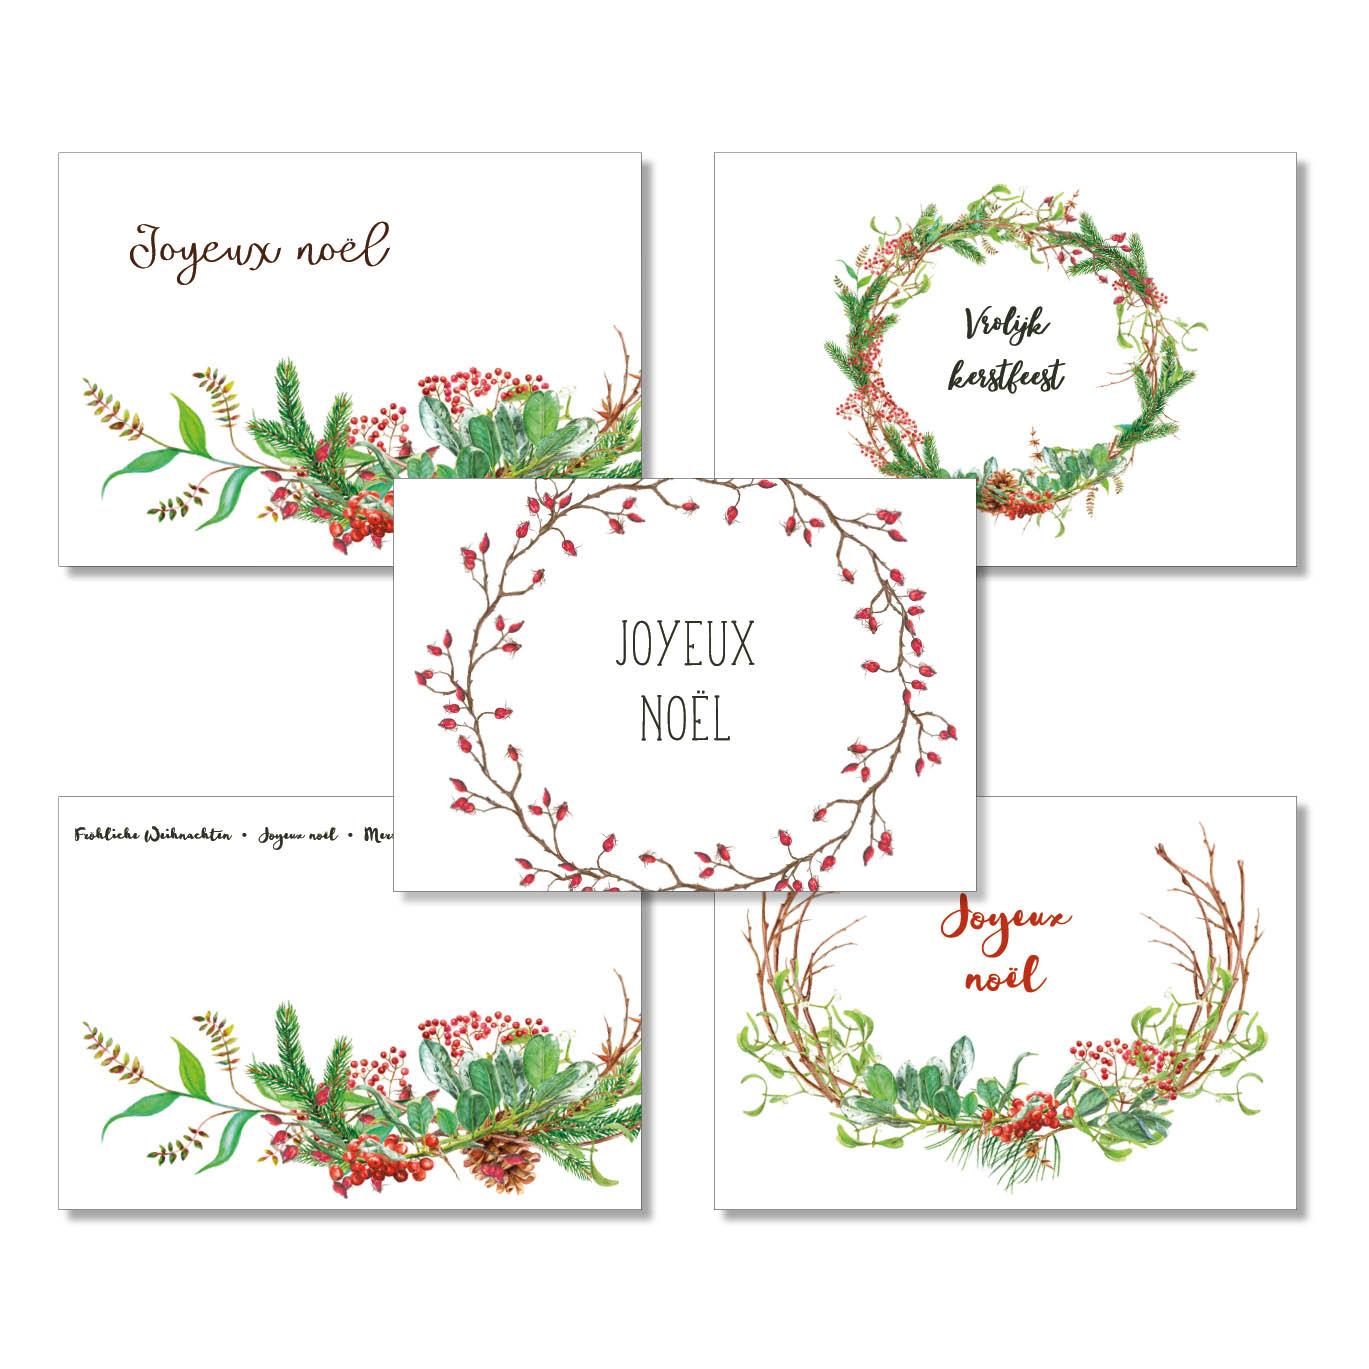 Postkarten-Set Weihnachten international III, 5 Stück